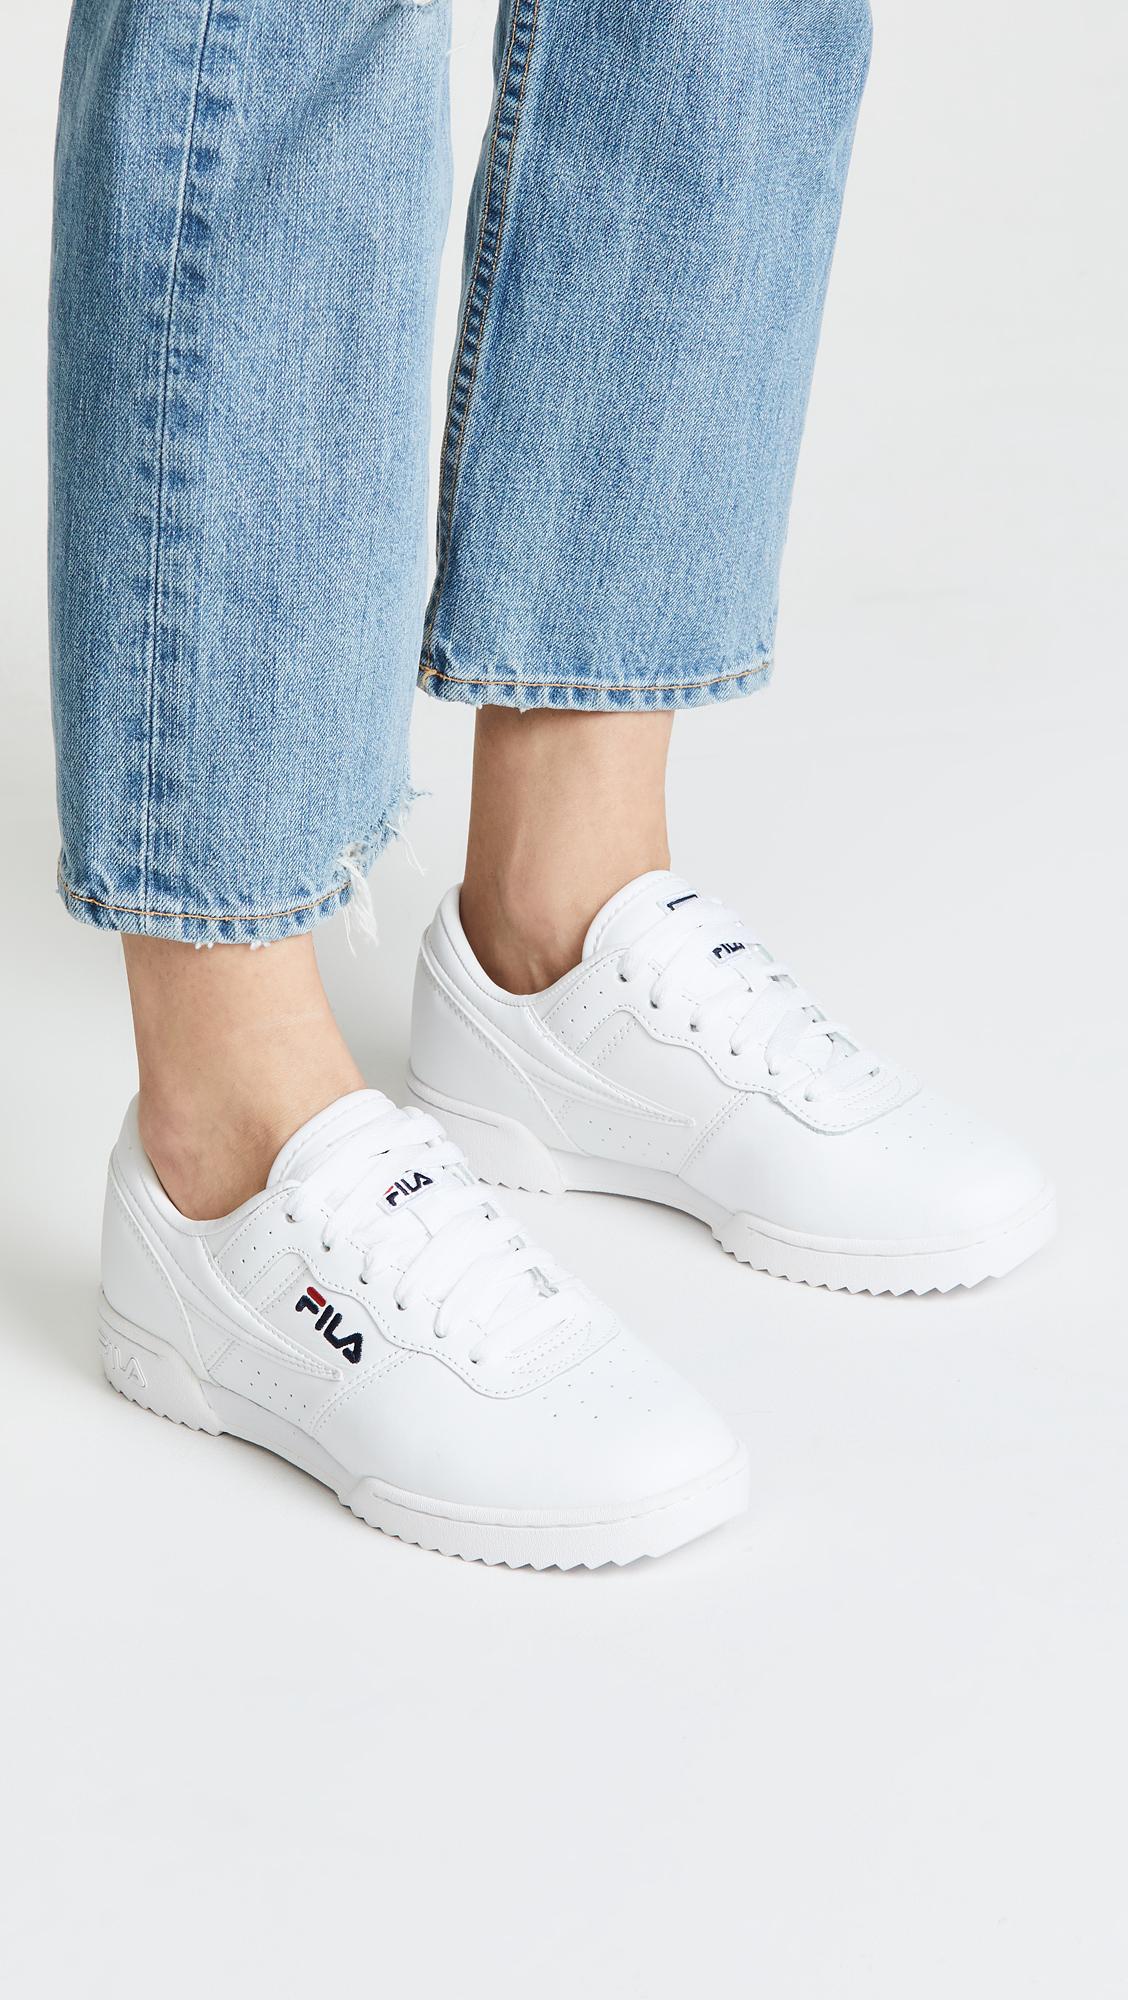 6a3decfba612 Fila Original Ripple Sneakers